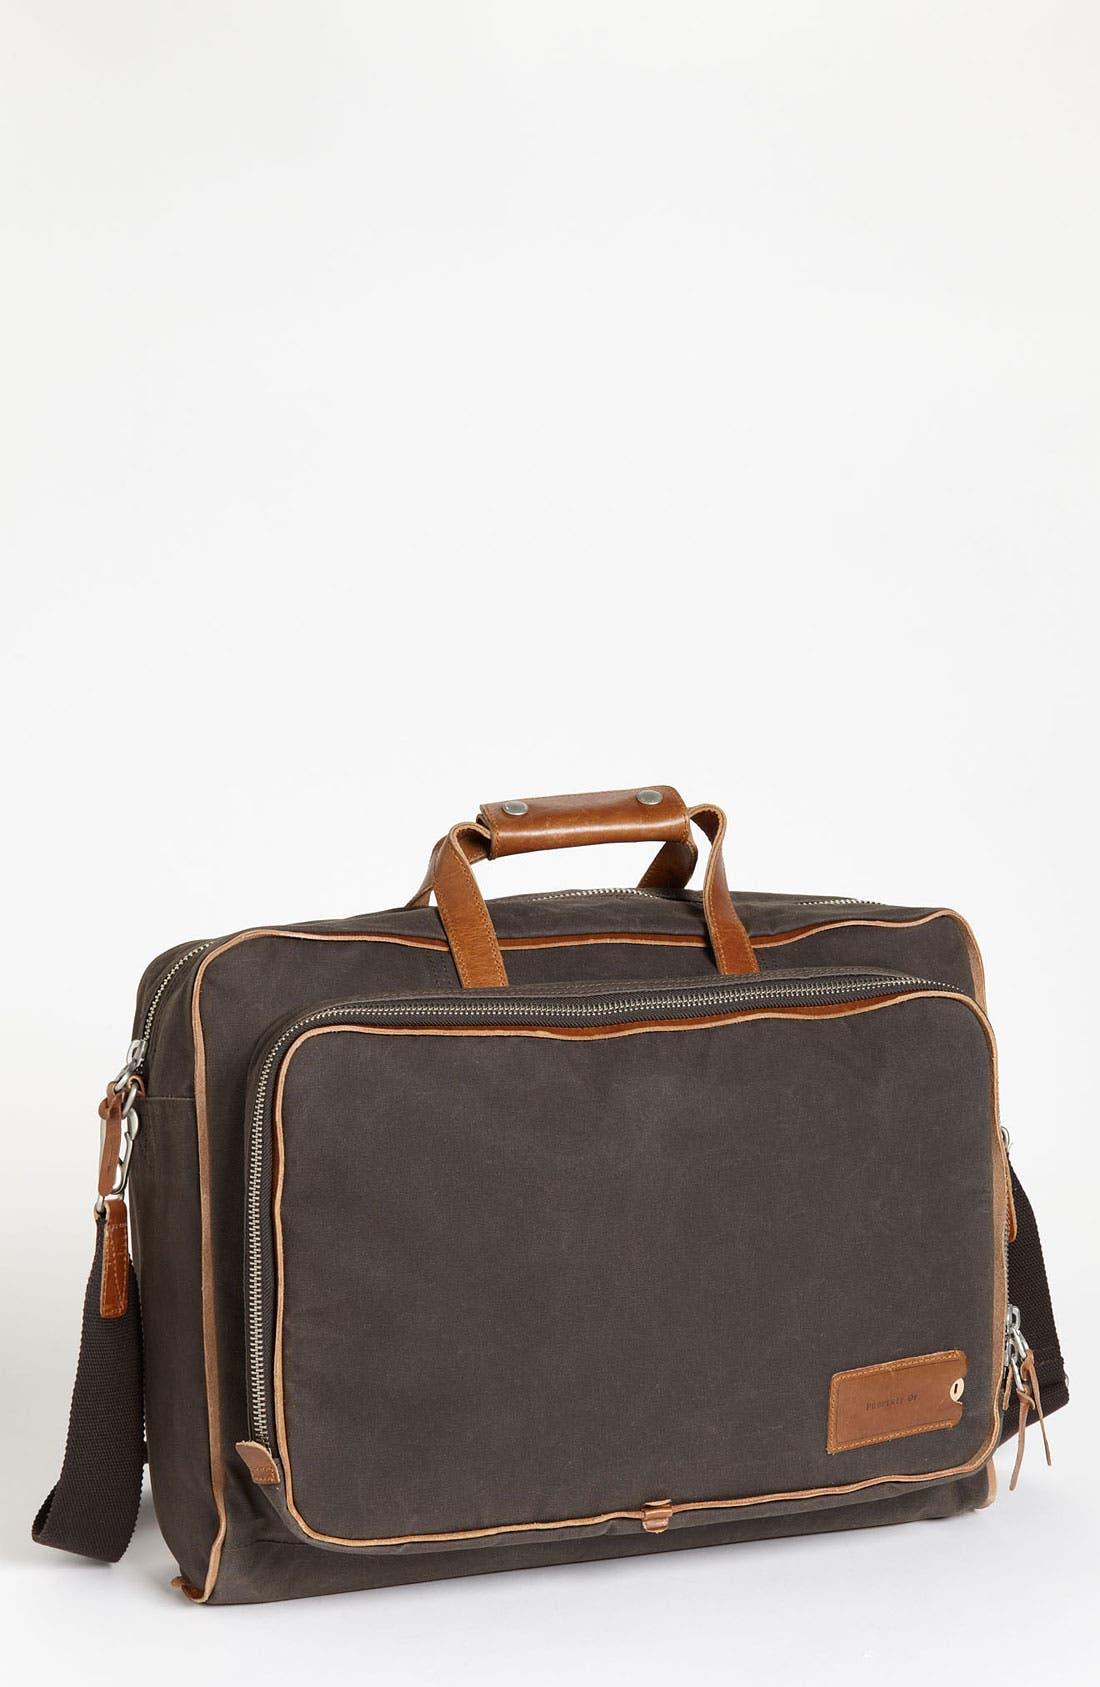 Main Image - Property Of... 'Arnald' Overnight Bag